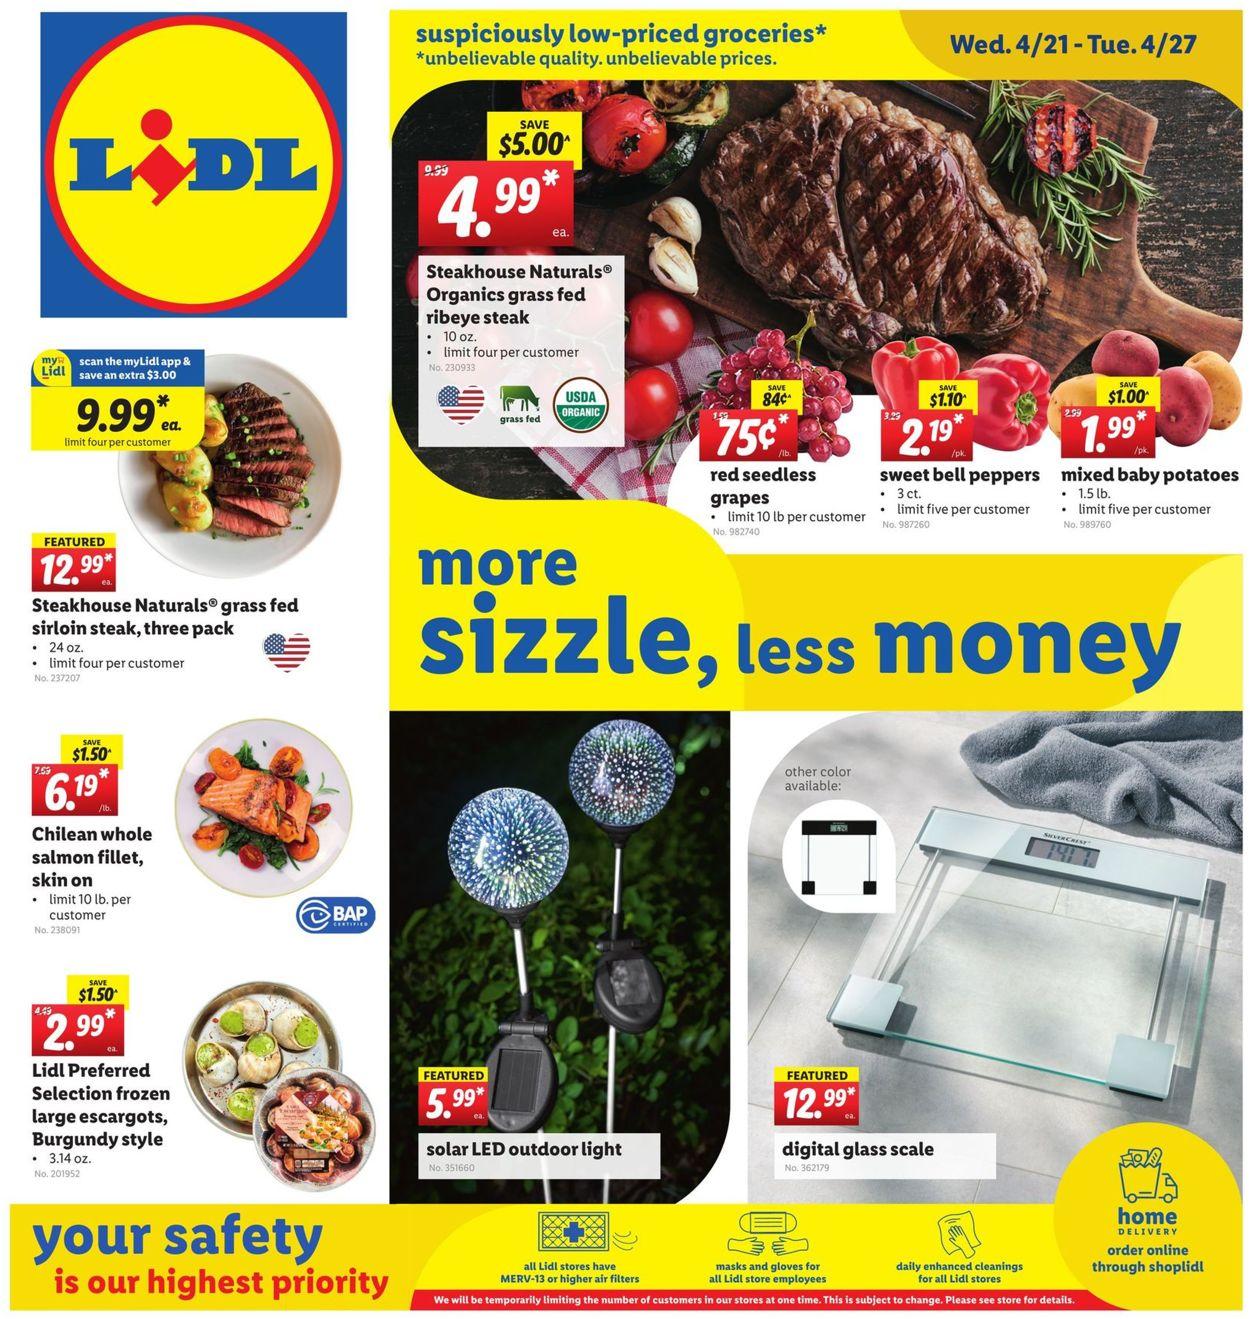 Lidl Weekly Ad Circular - valid 04/21-04/27/2021